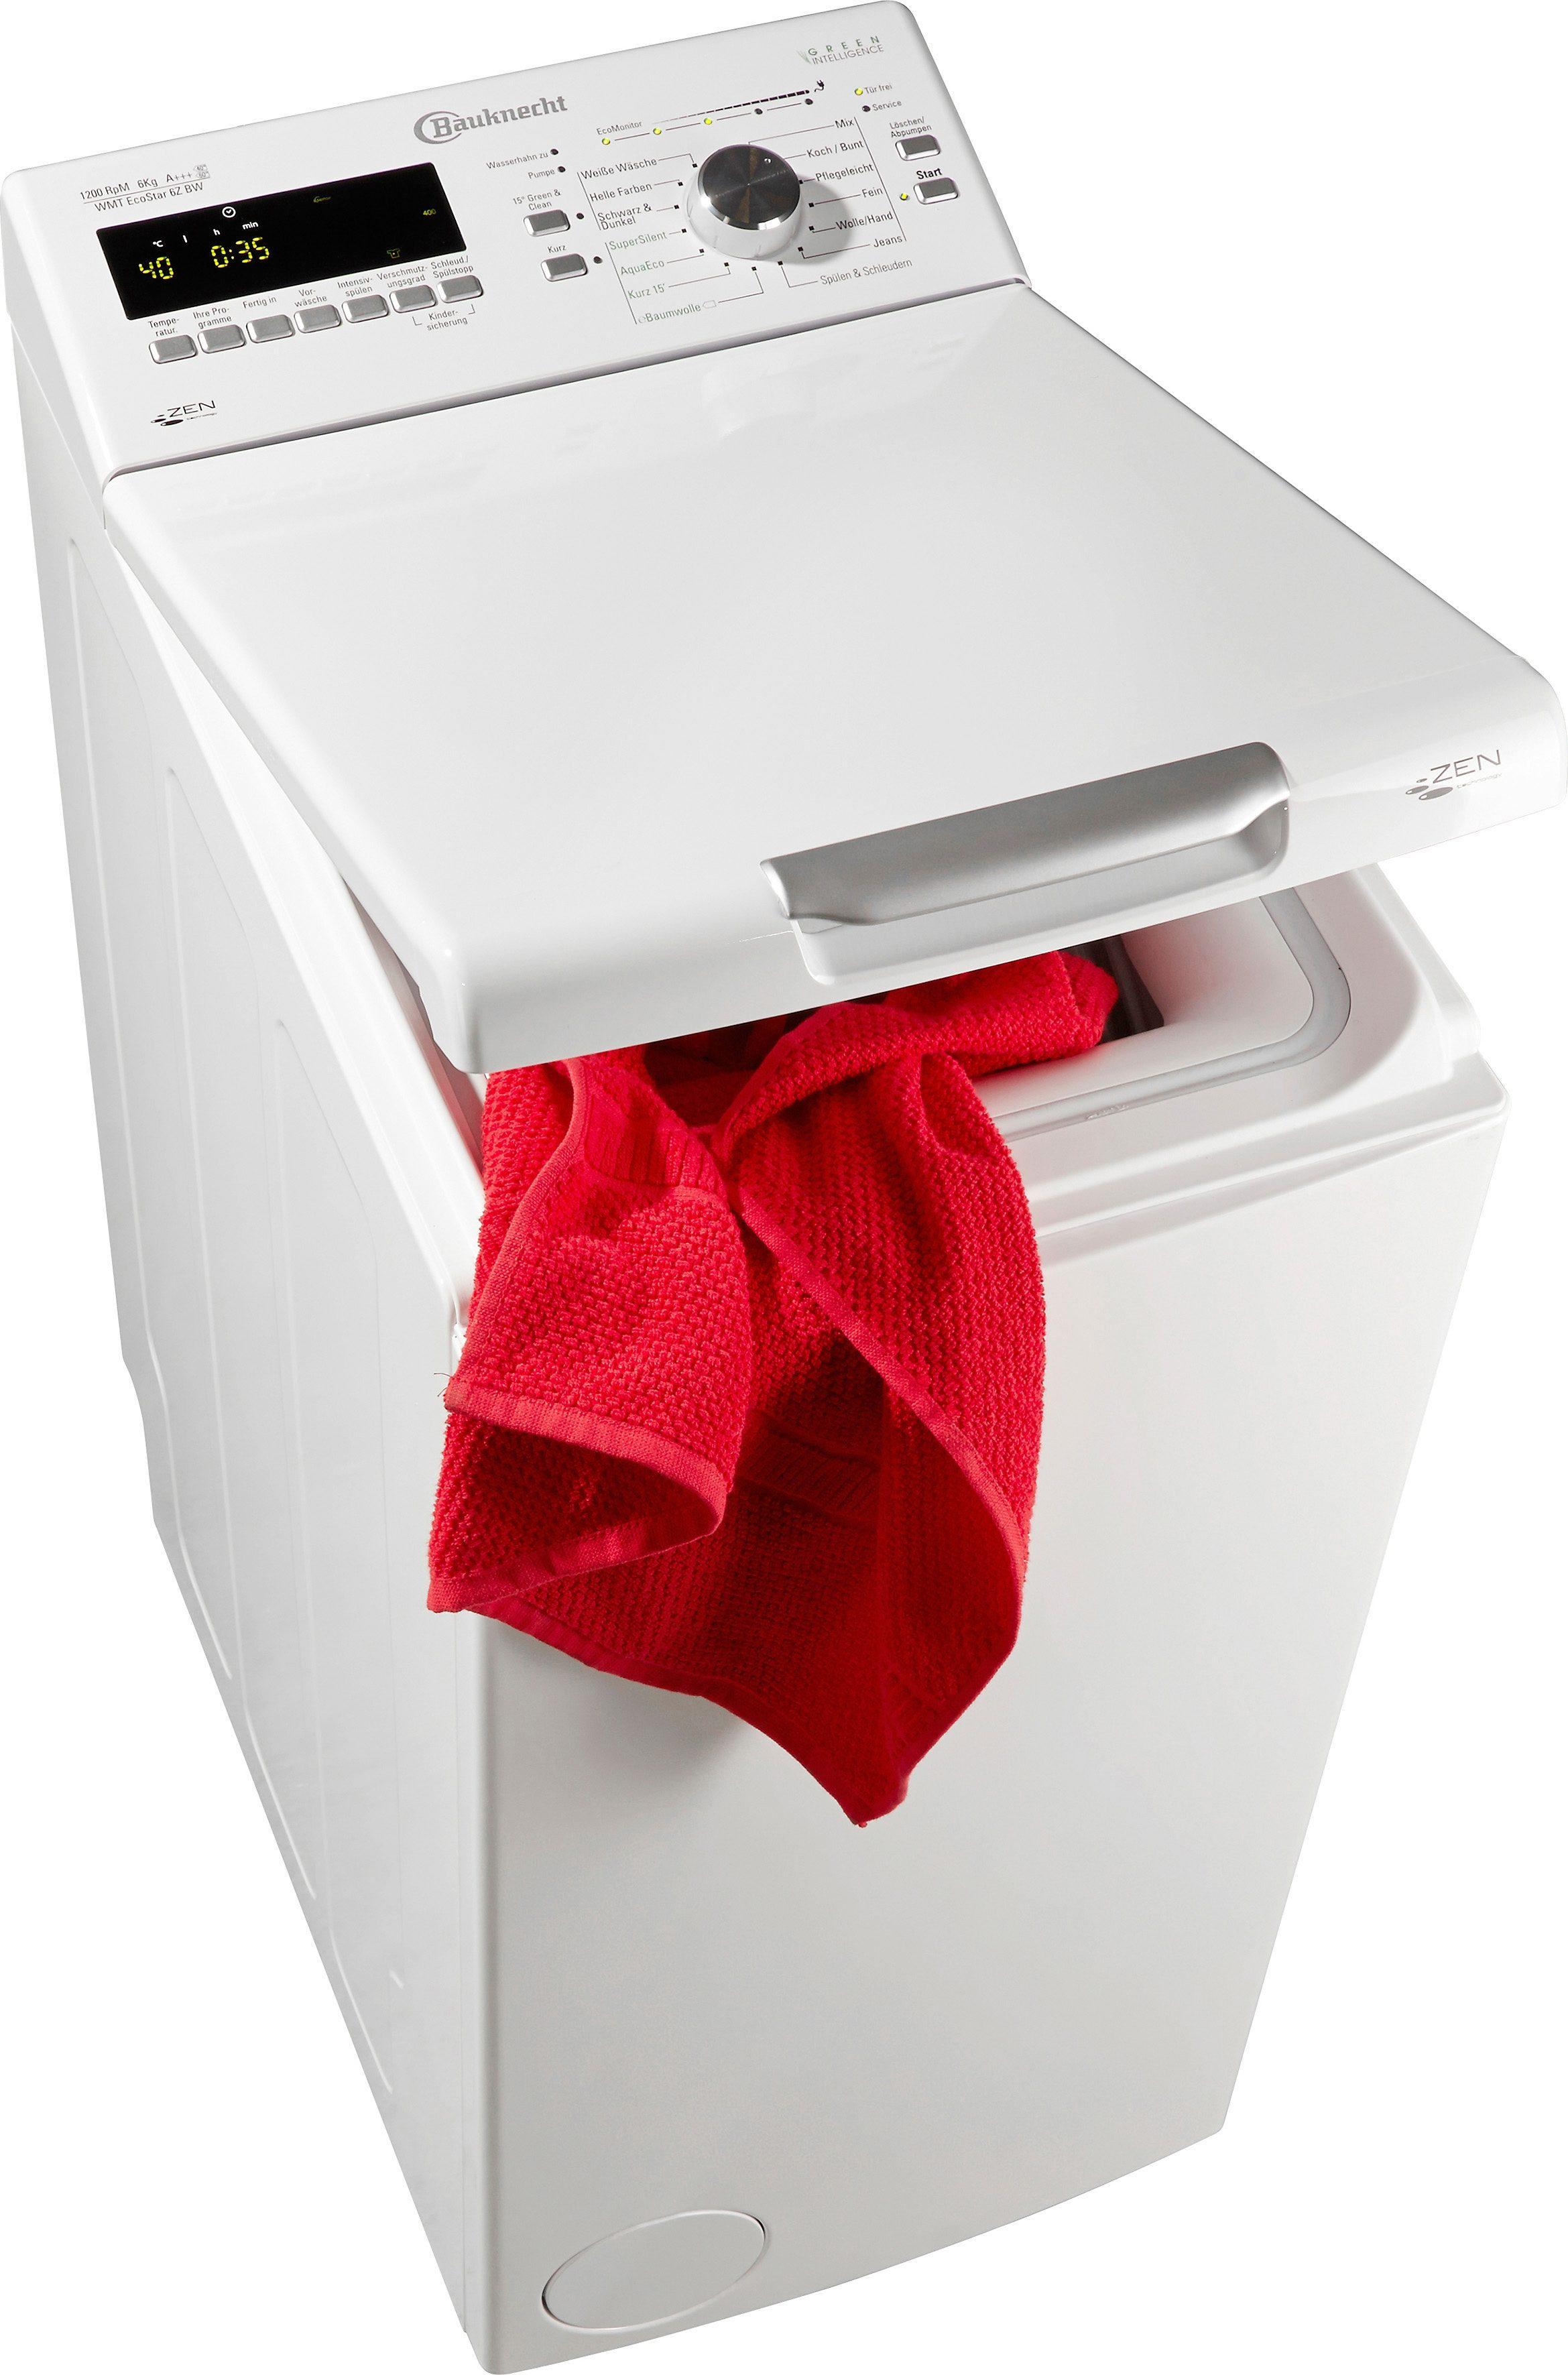 BAUKNECHT Waschmaschine Toplader WMT EcoStar 6Z BW, A+++, 6 kg, 1200 U/Min